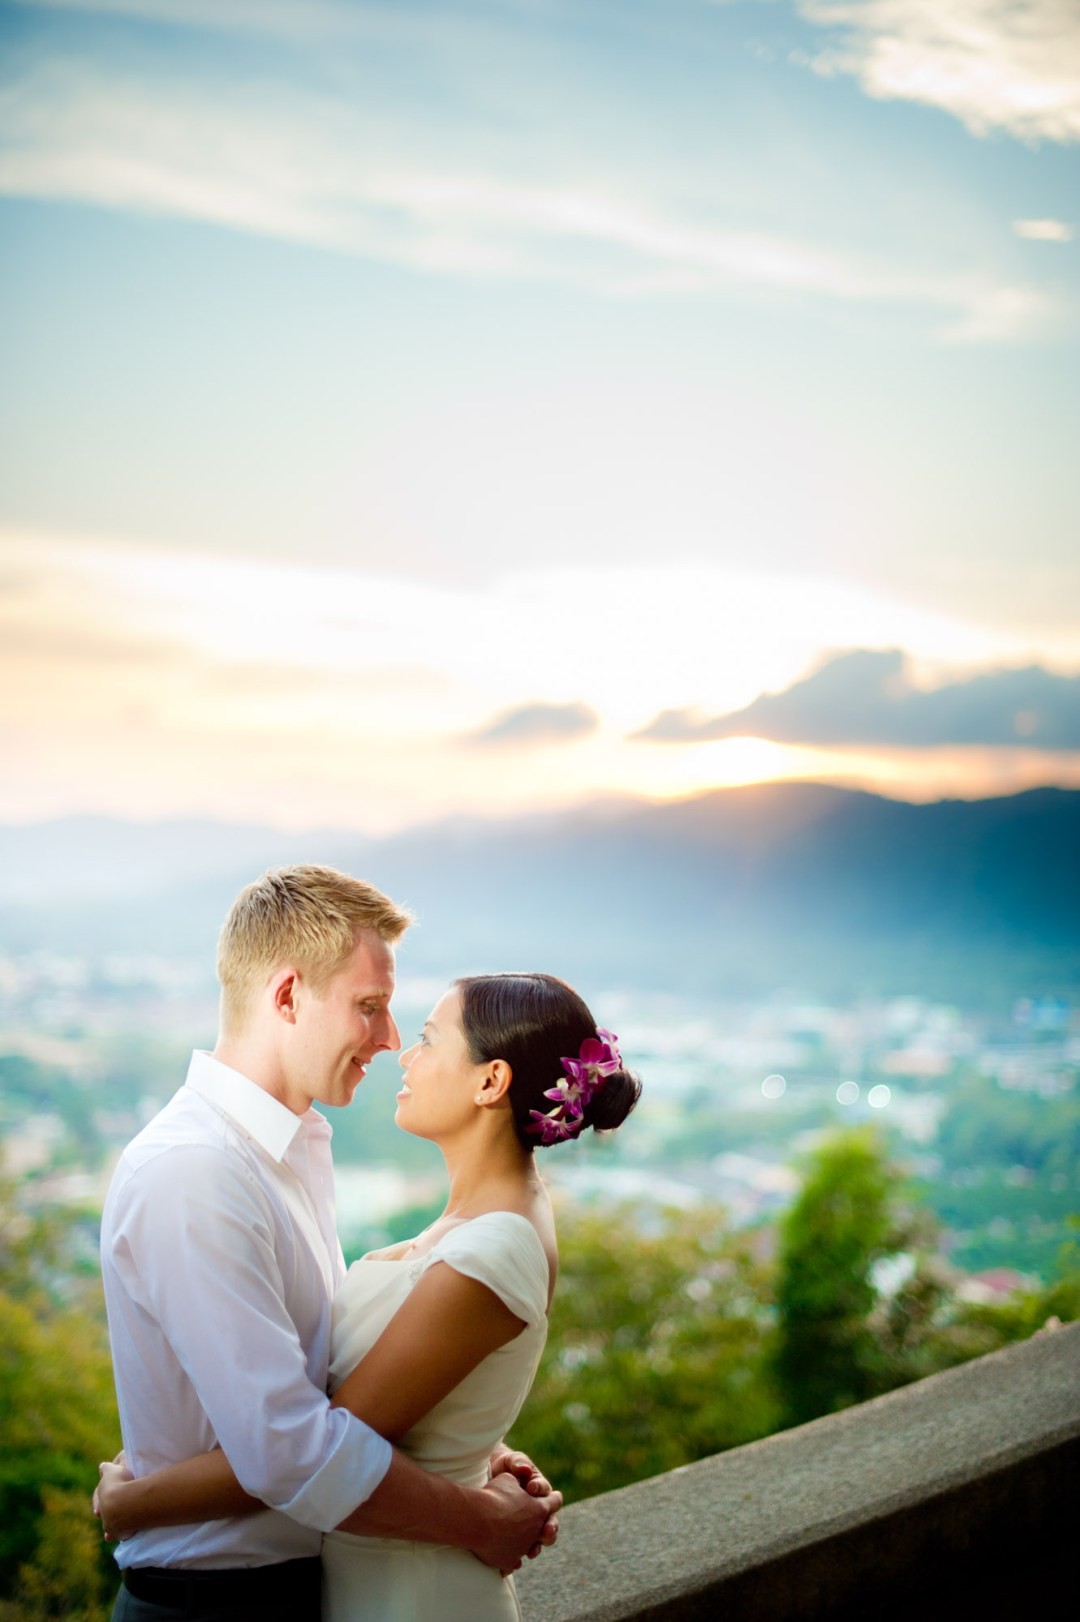 Phuket Wedding Photography | Rang Hill Viewpoint Pre-Wedding Photography